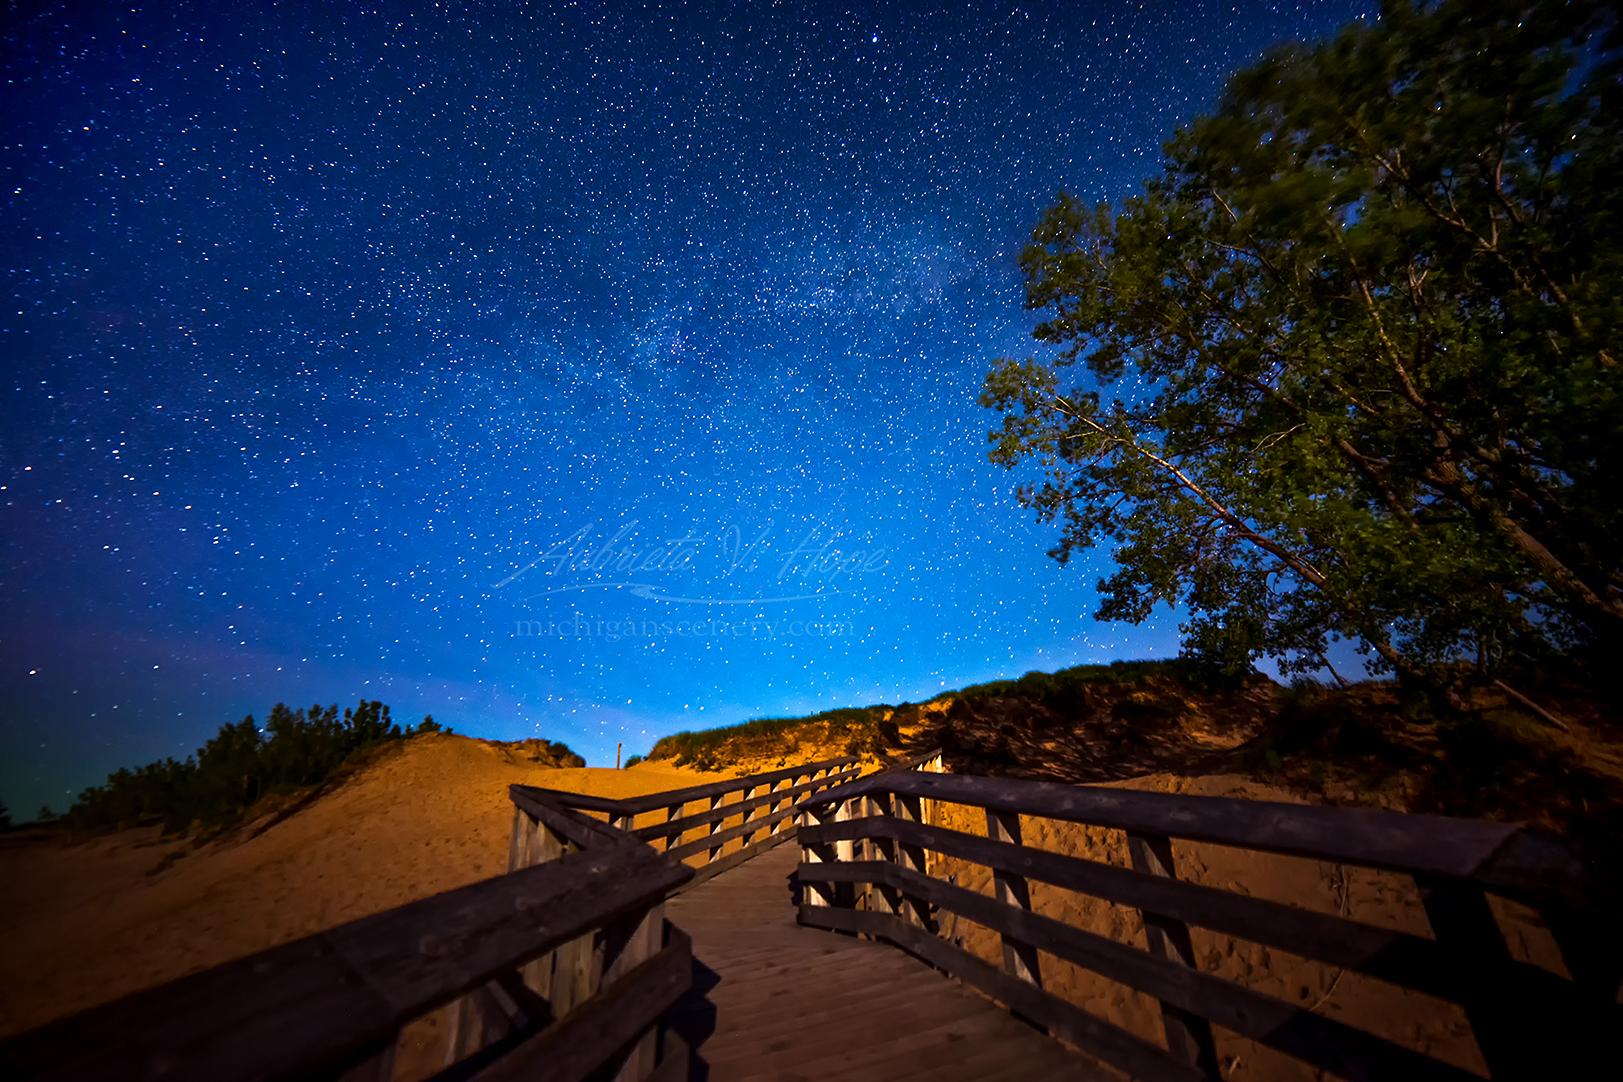 MI15-0702-9822 Milky Way at Overlook 9 by Aubrieta V Hope Michigan Scenery.jpg